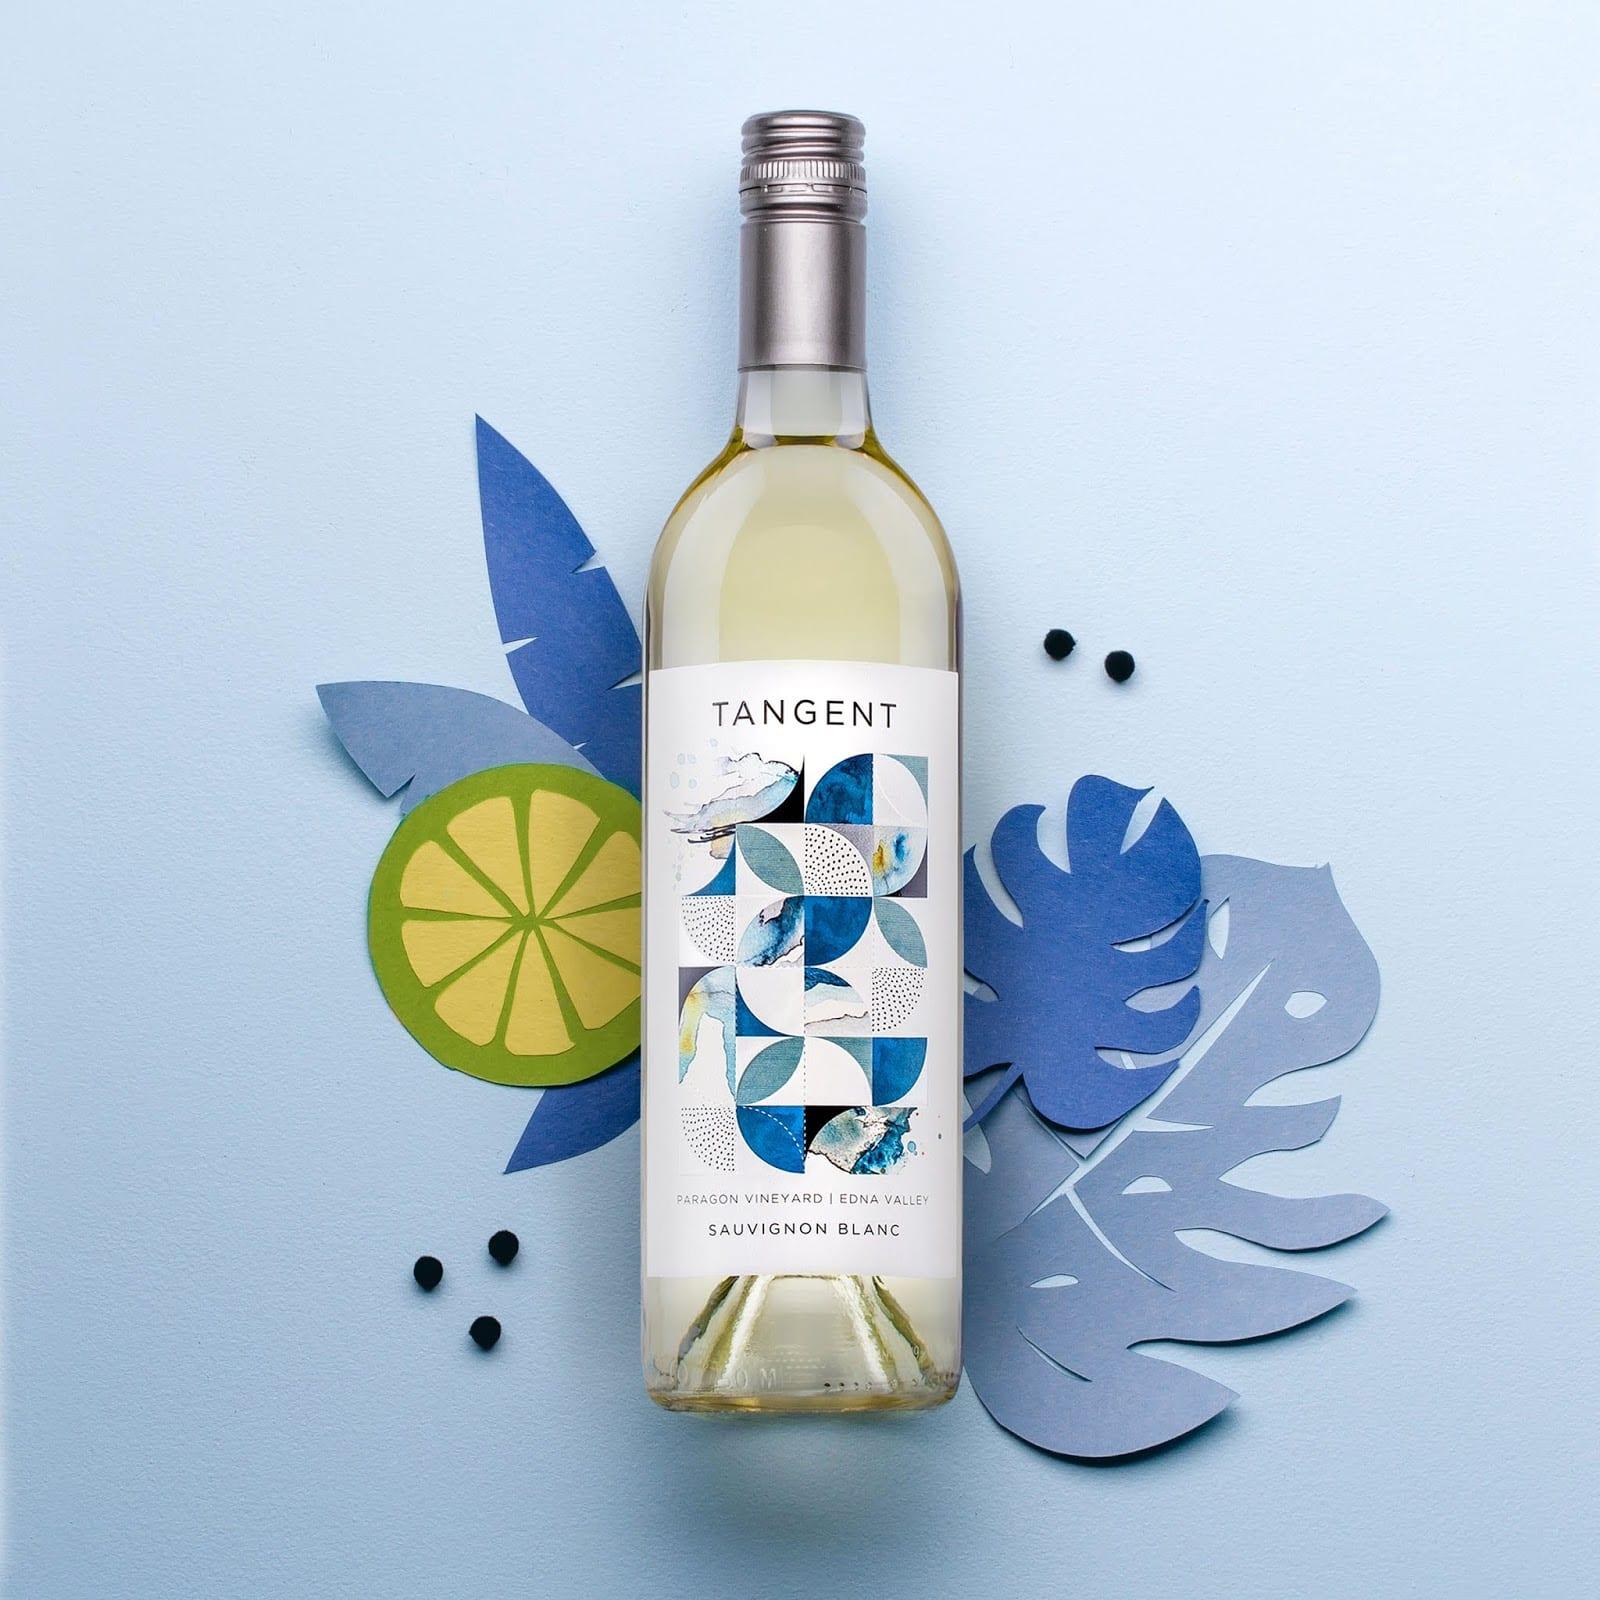 TANGENT img 2 - Redesign obalu Tangent Wines, populárních vín z Kalifornie